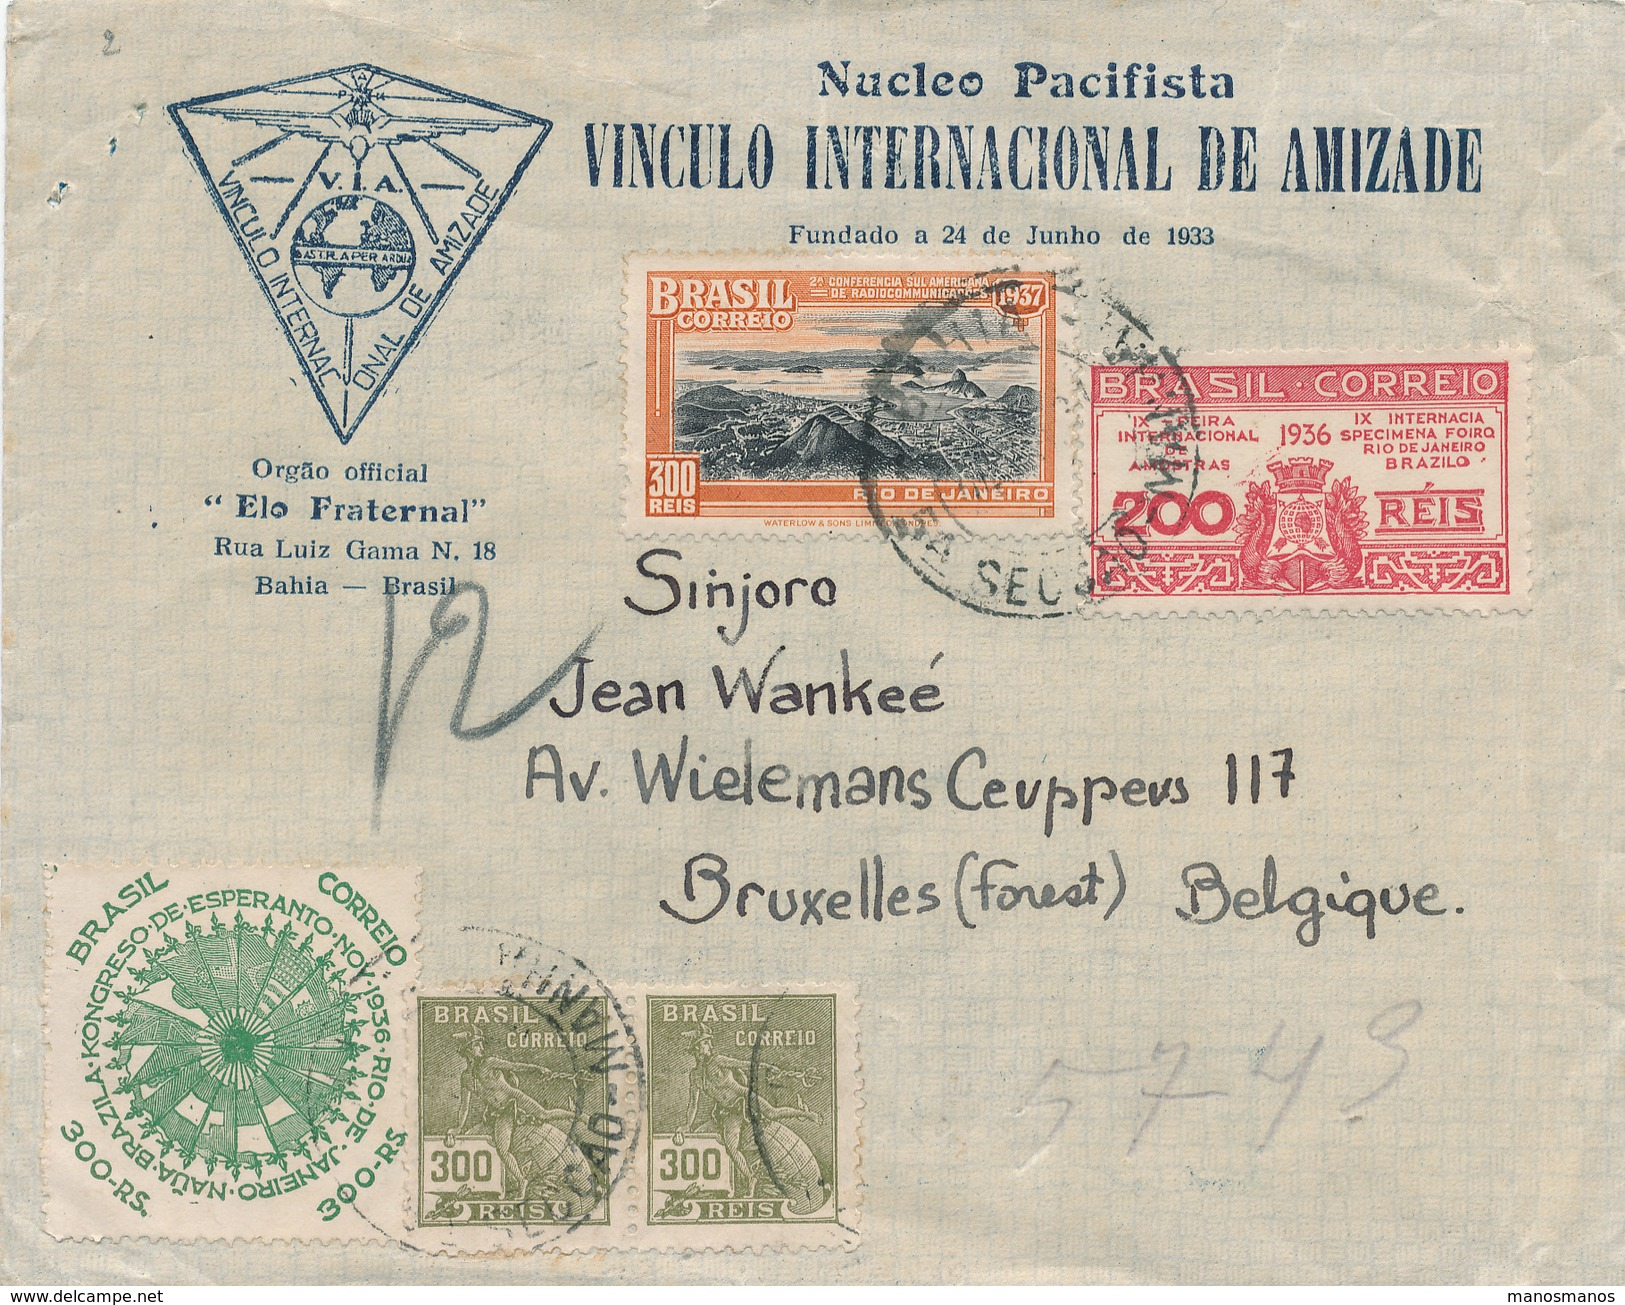 334/25 - ESPERANTO BRASIL - Superbe Lettre à Entete + Timbre + Vignette ESPERANTO 1936/37 - Esperanto